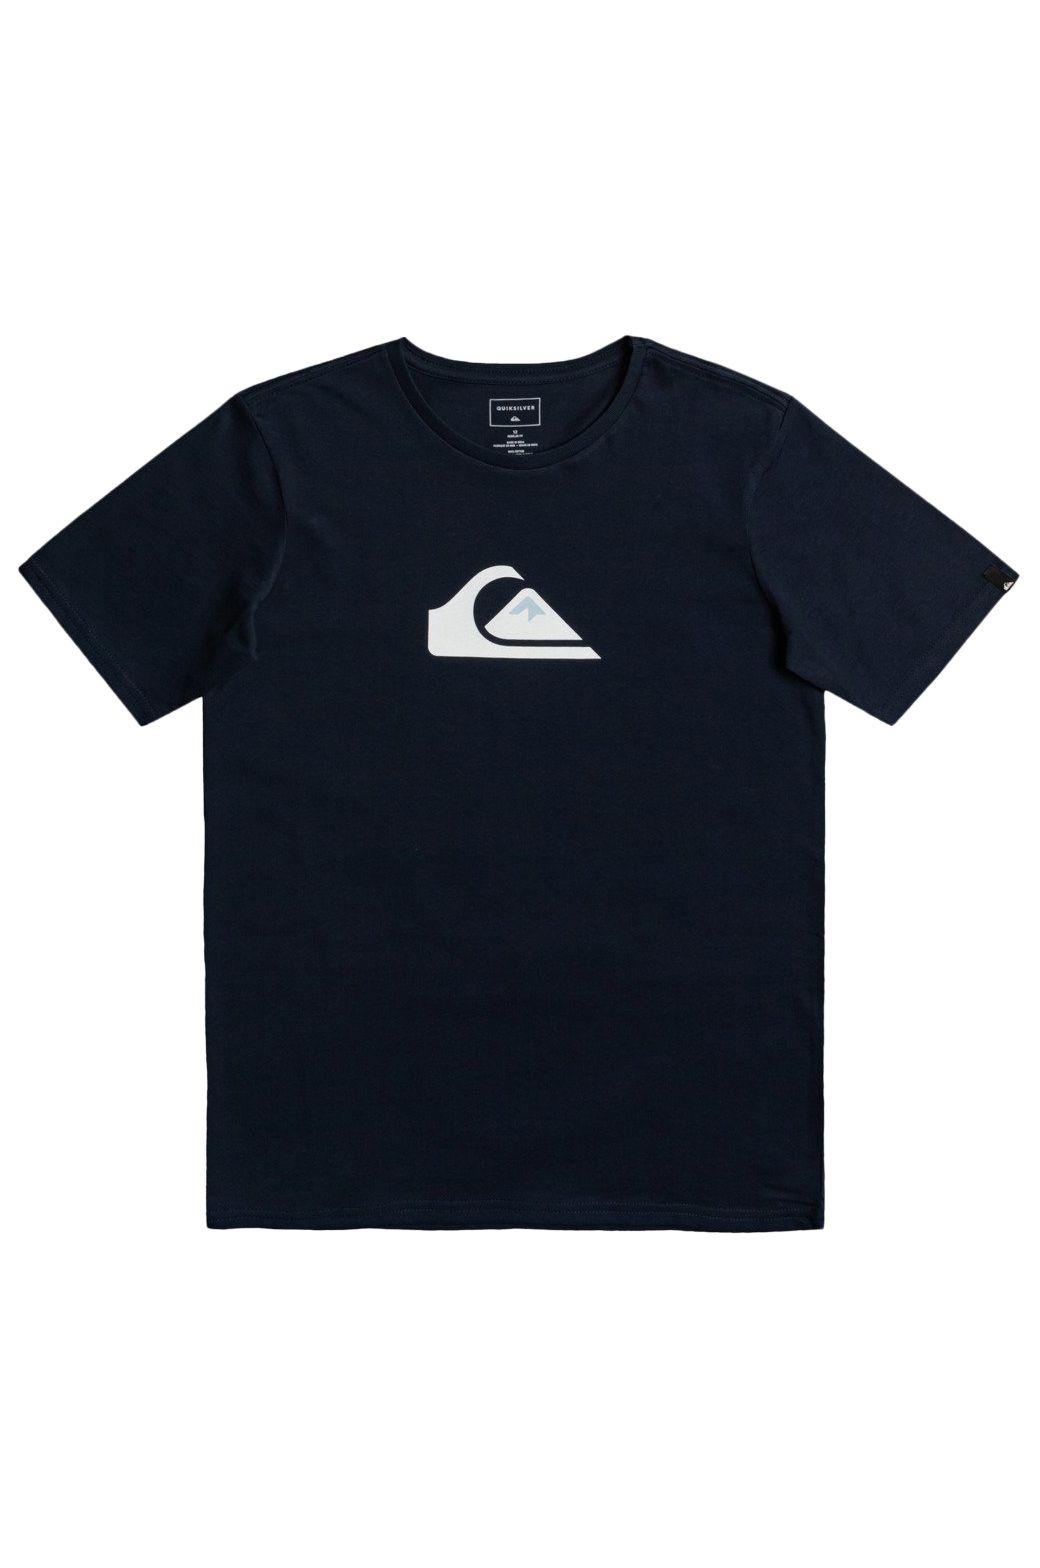 T-Shirt Quiksilver COMP LOGO Navy Blazer